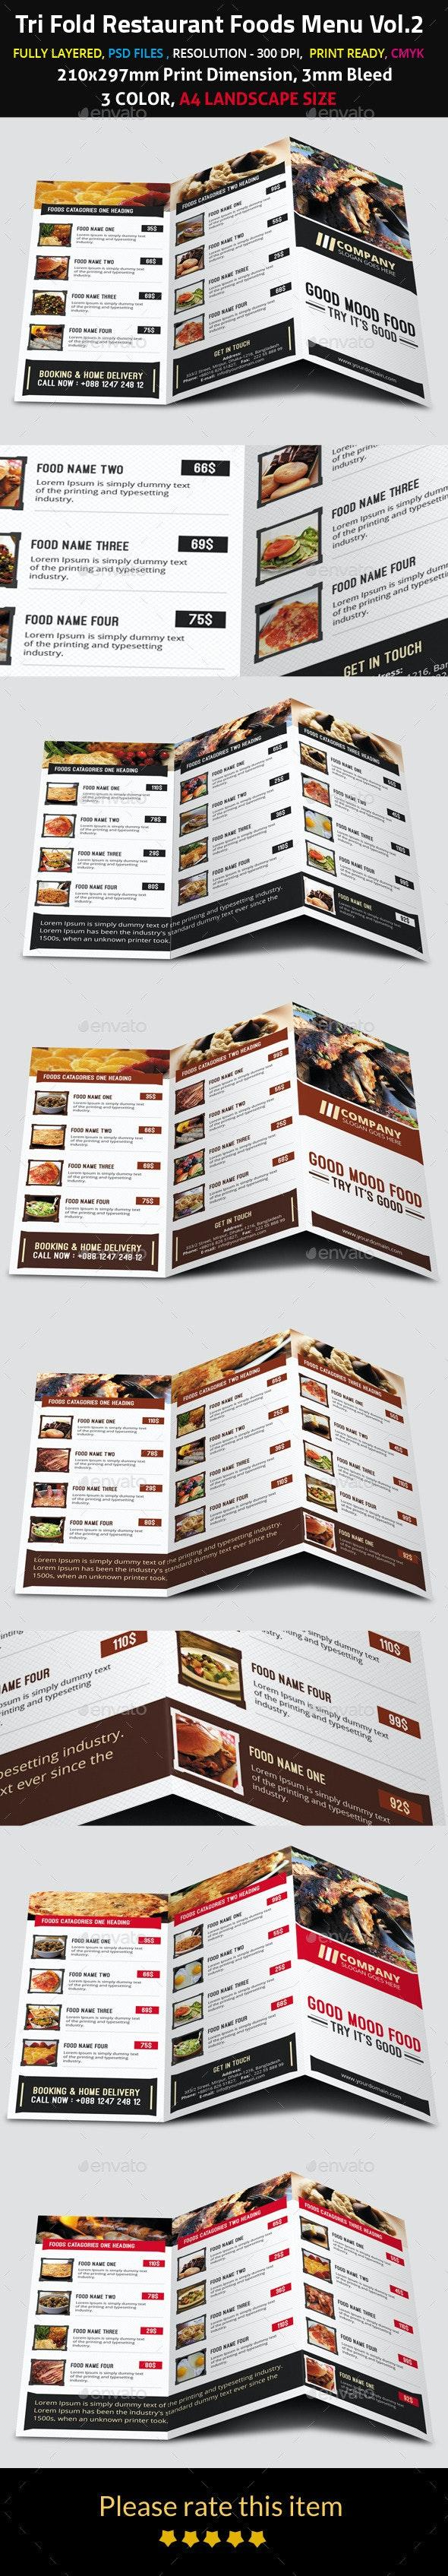 Tri Fold Restaurant Foods Menu Vol.2